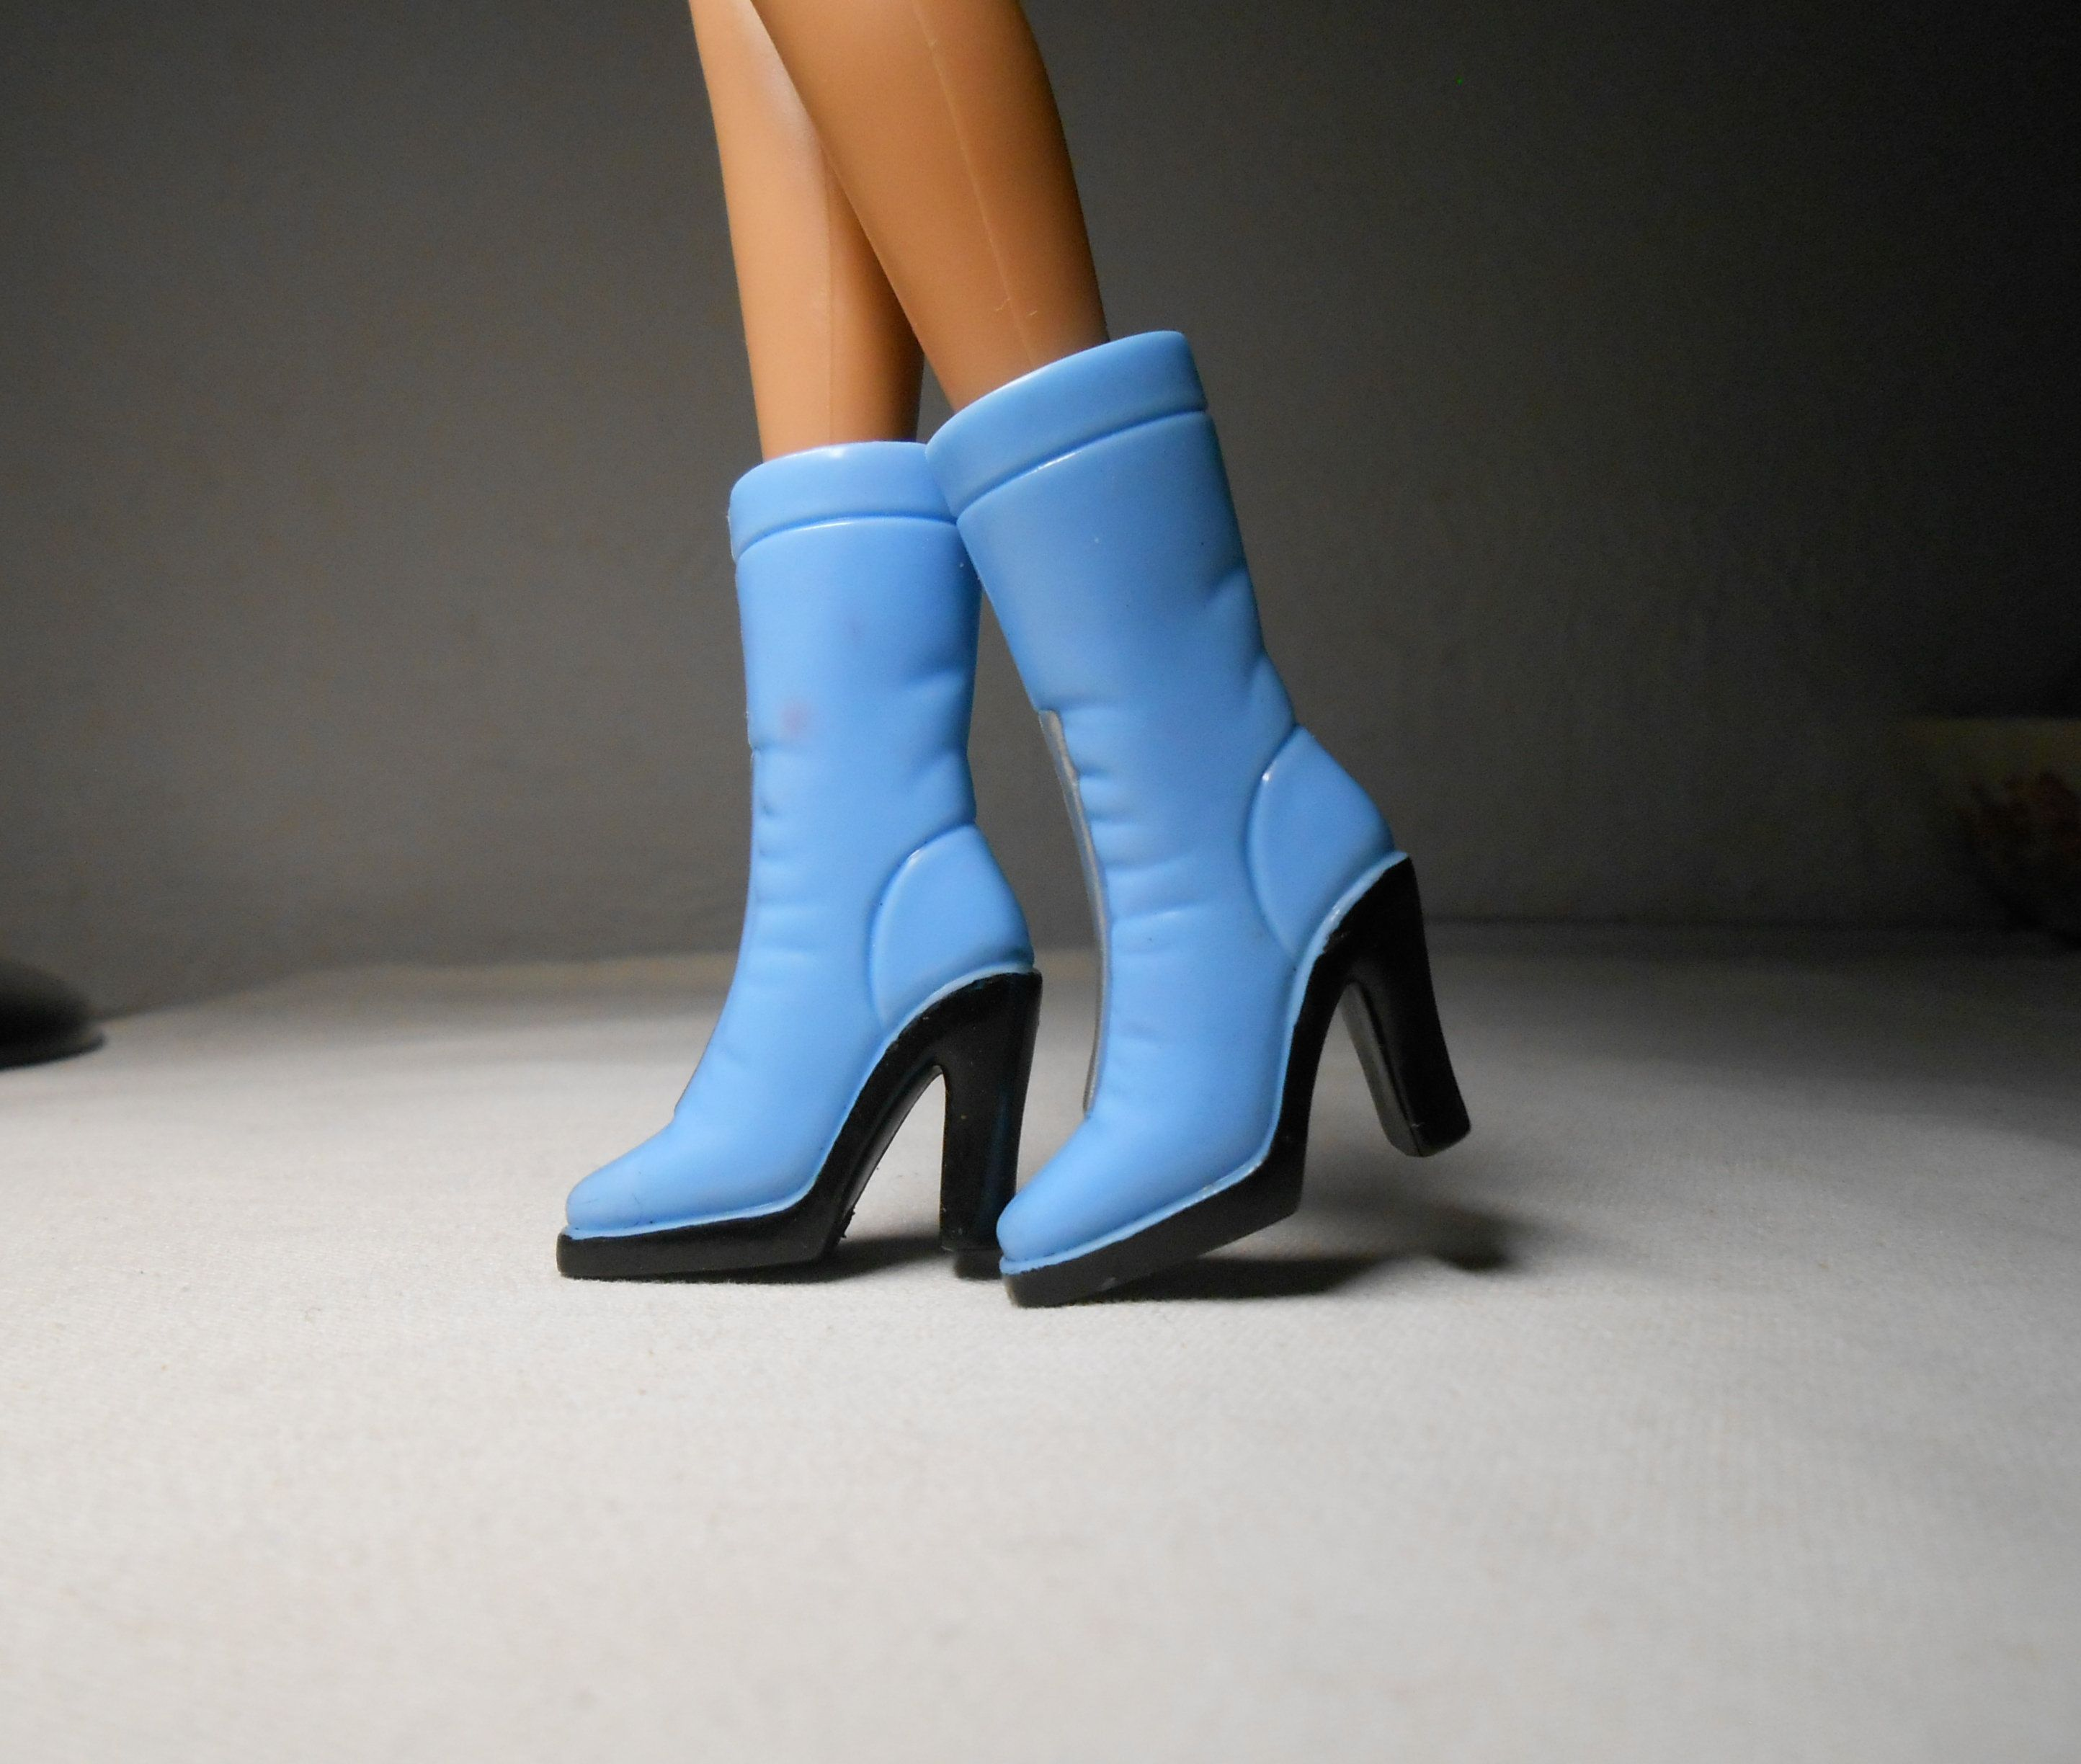 Barbie VINTAGE Mule Pantofola Sandalo Tacco Alto Punta Aperta selezione adattarla ai piedi 2cm